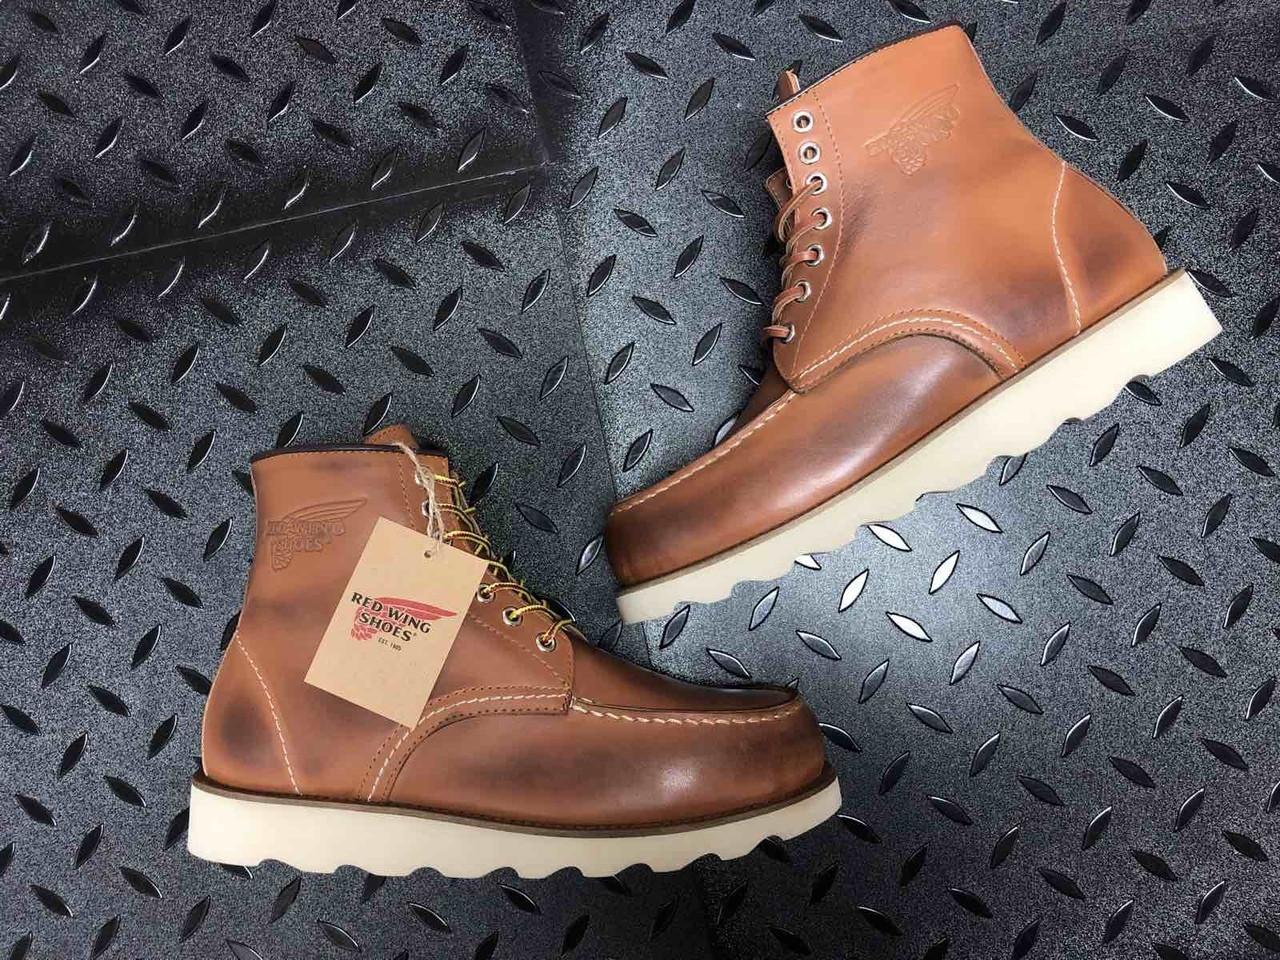 🔥 Ботинки мужские Red Wing Stitch демисезонные кожаные термо теплые коричневые